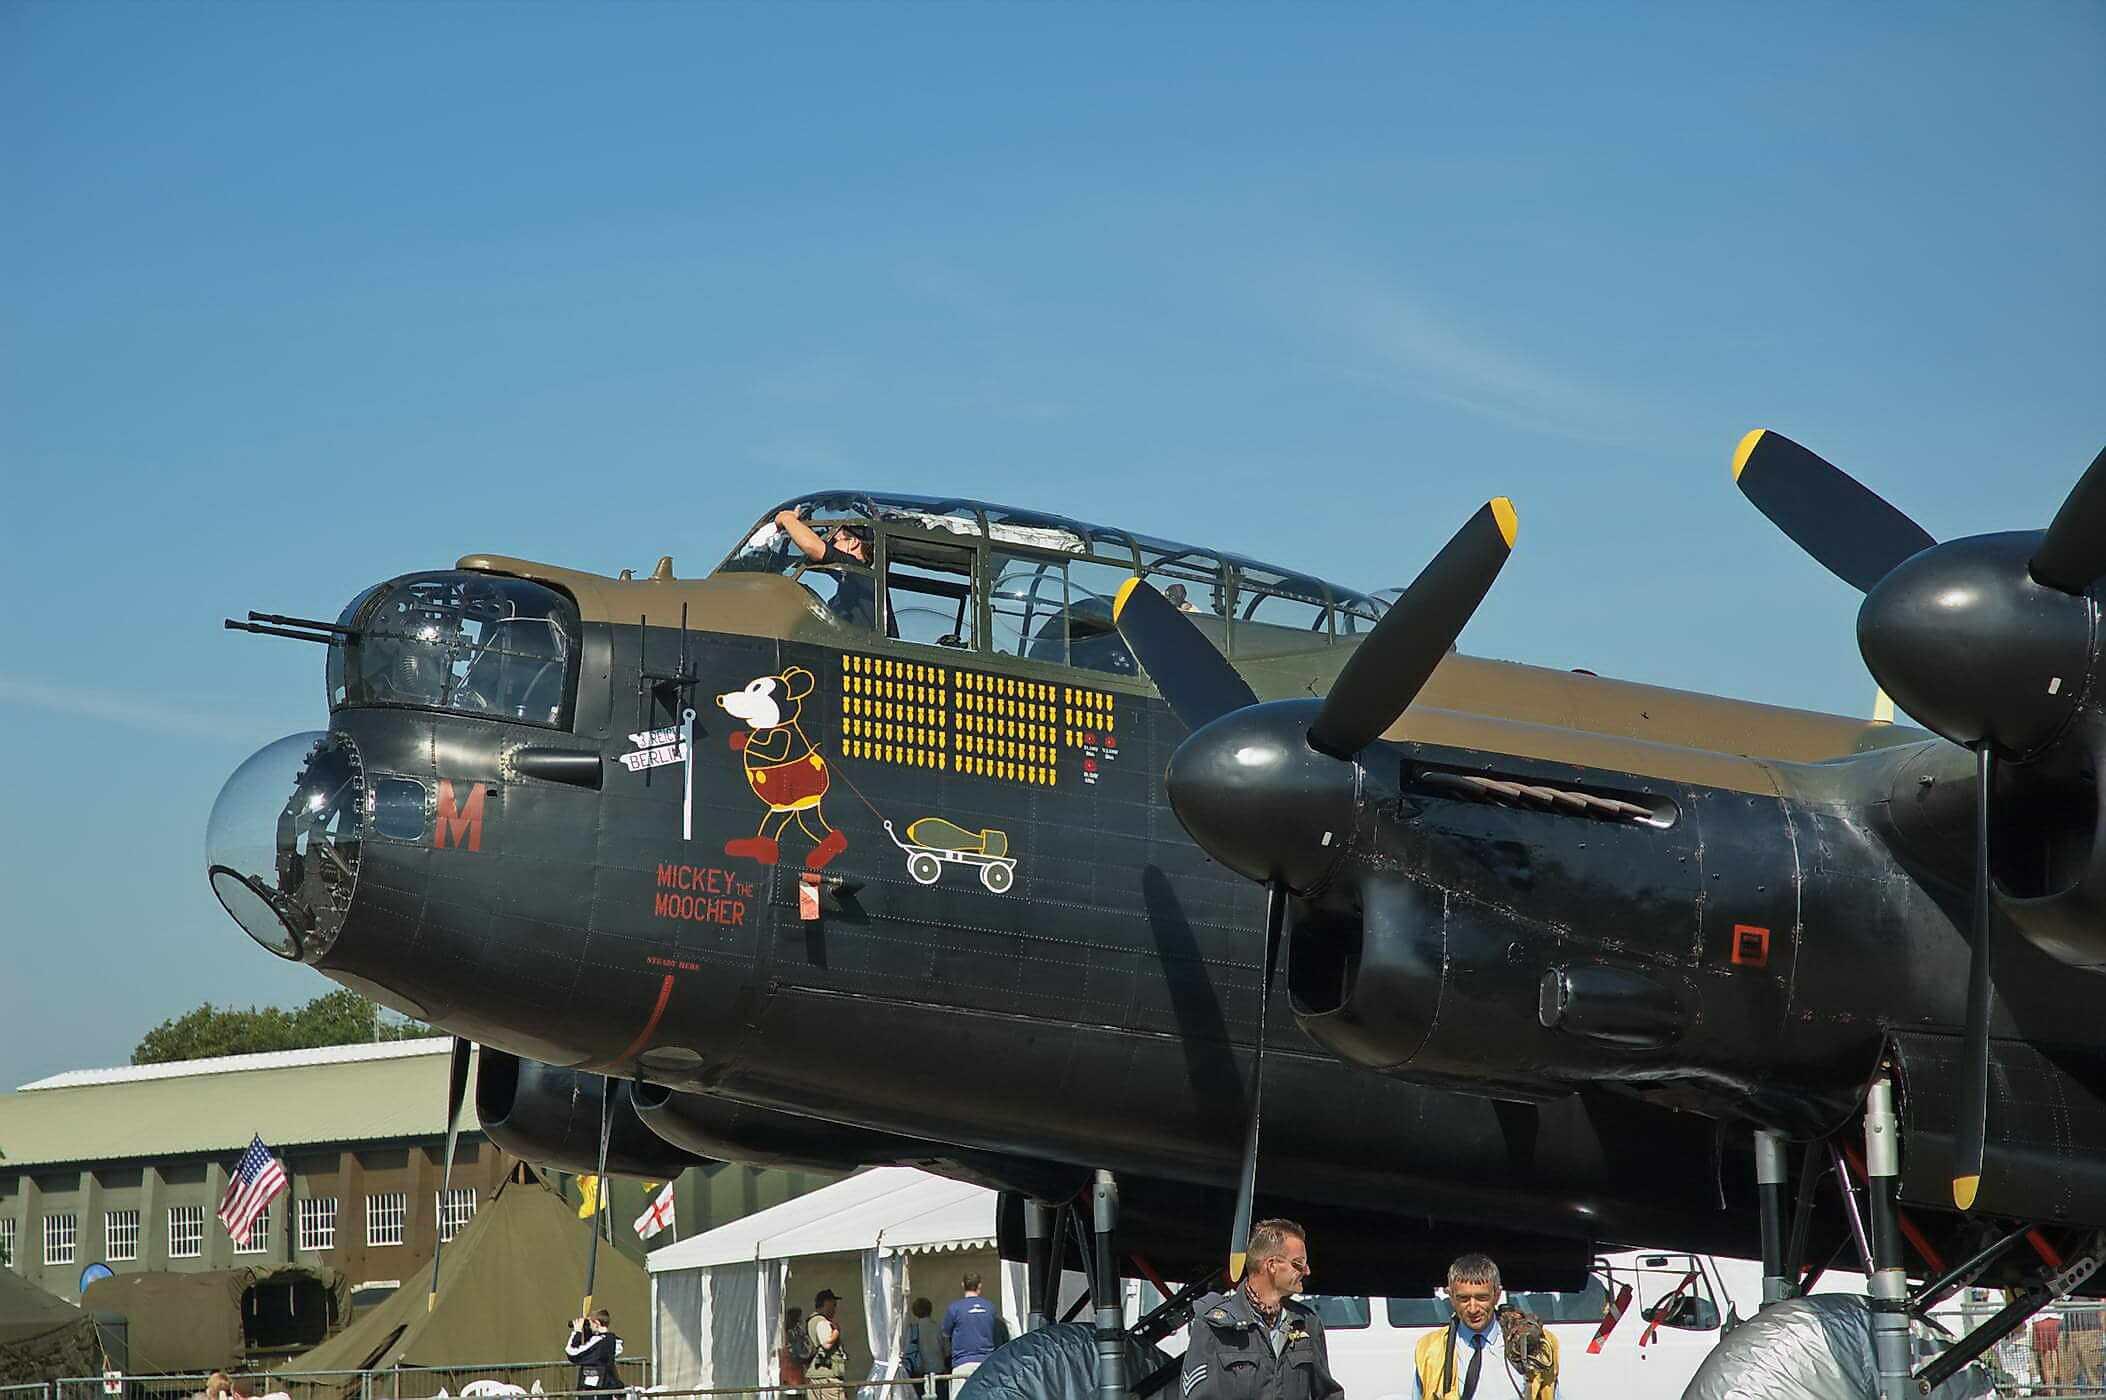 British aircraft ww2